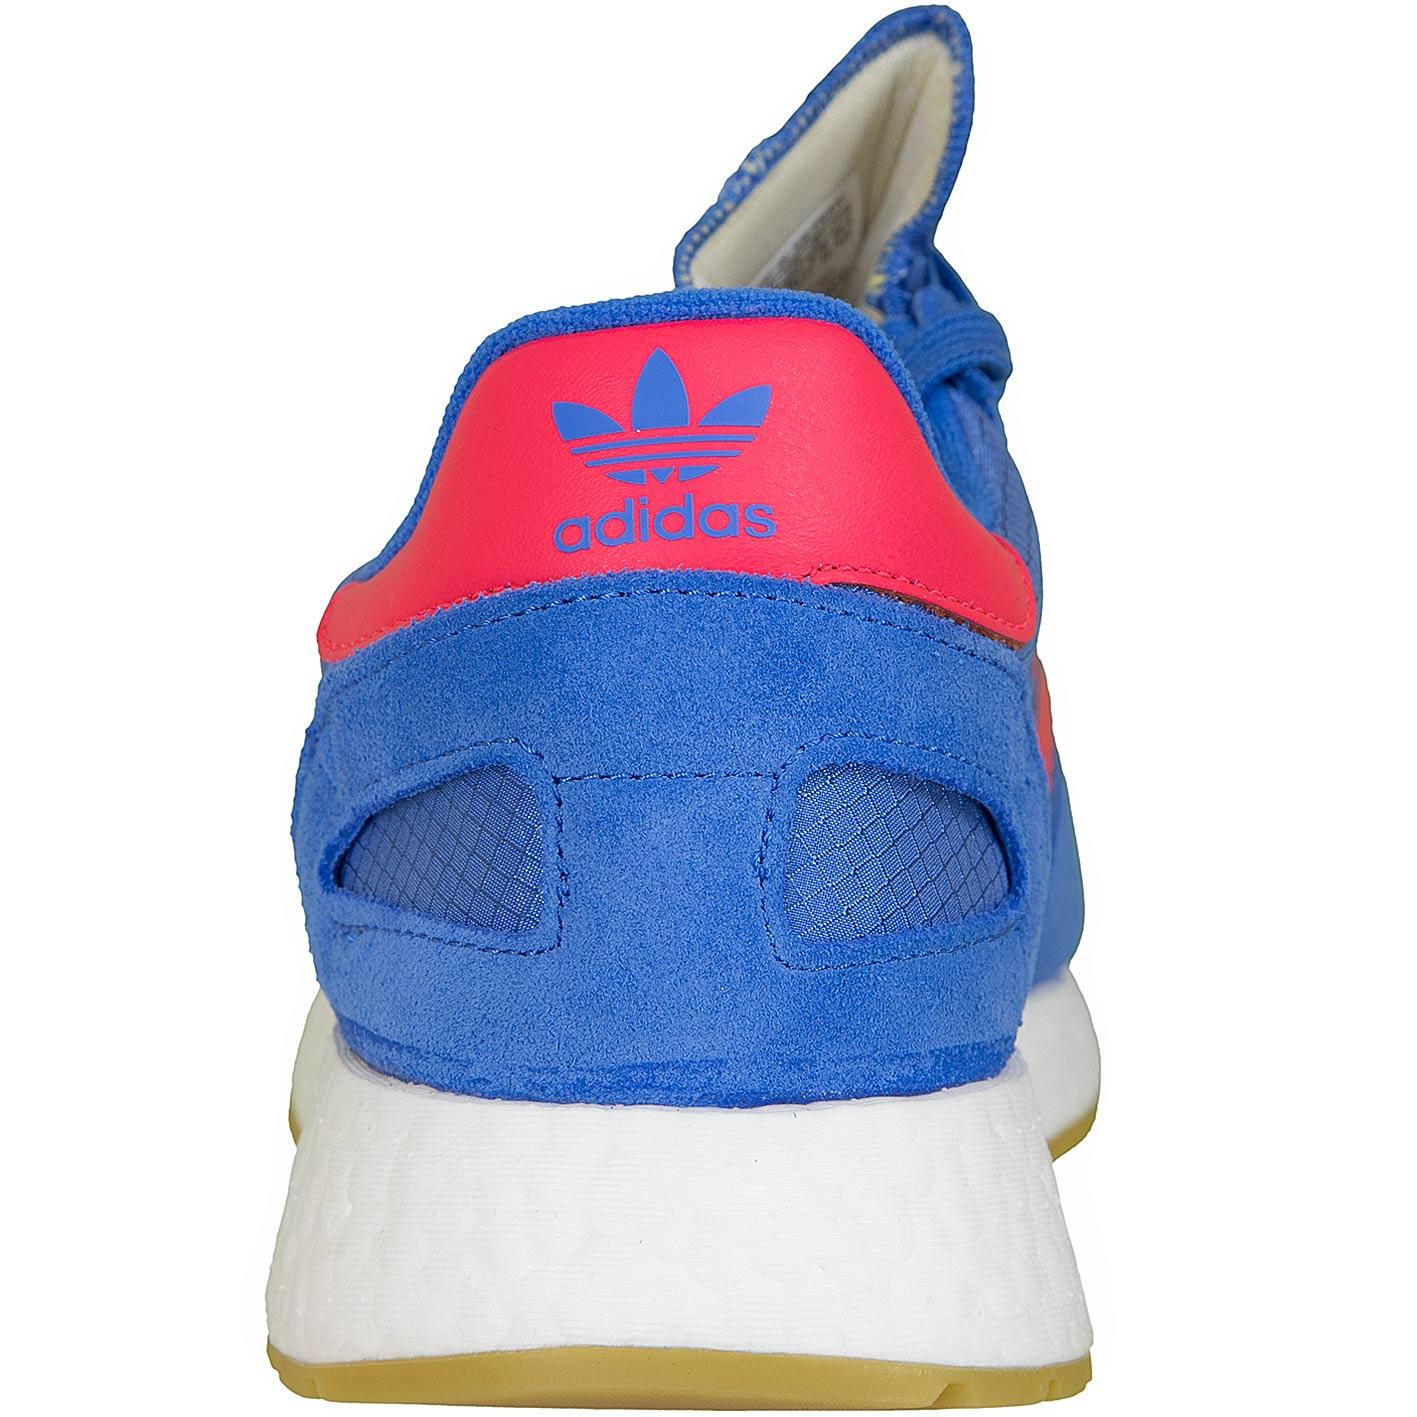 Adidas Originals Sneaker I 5923 blaurot